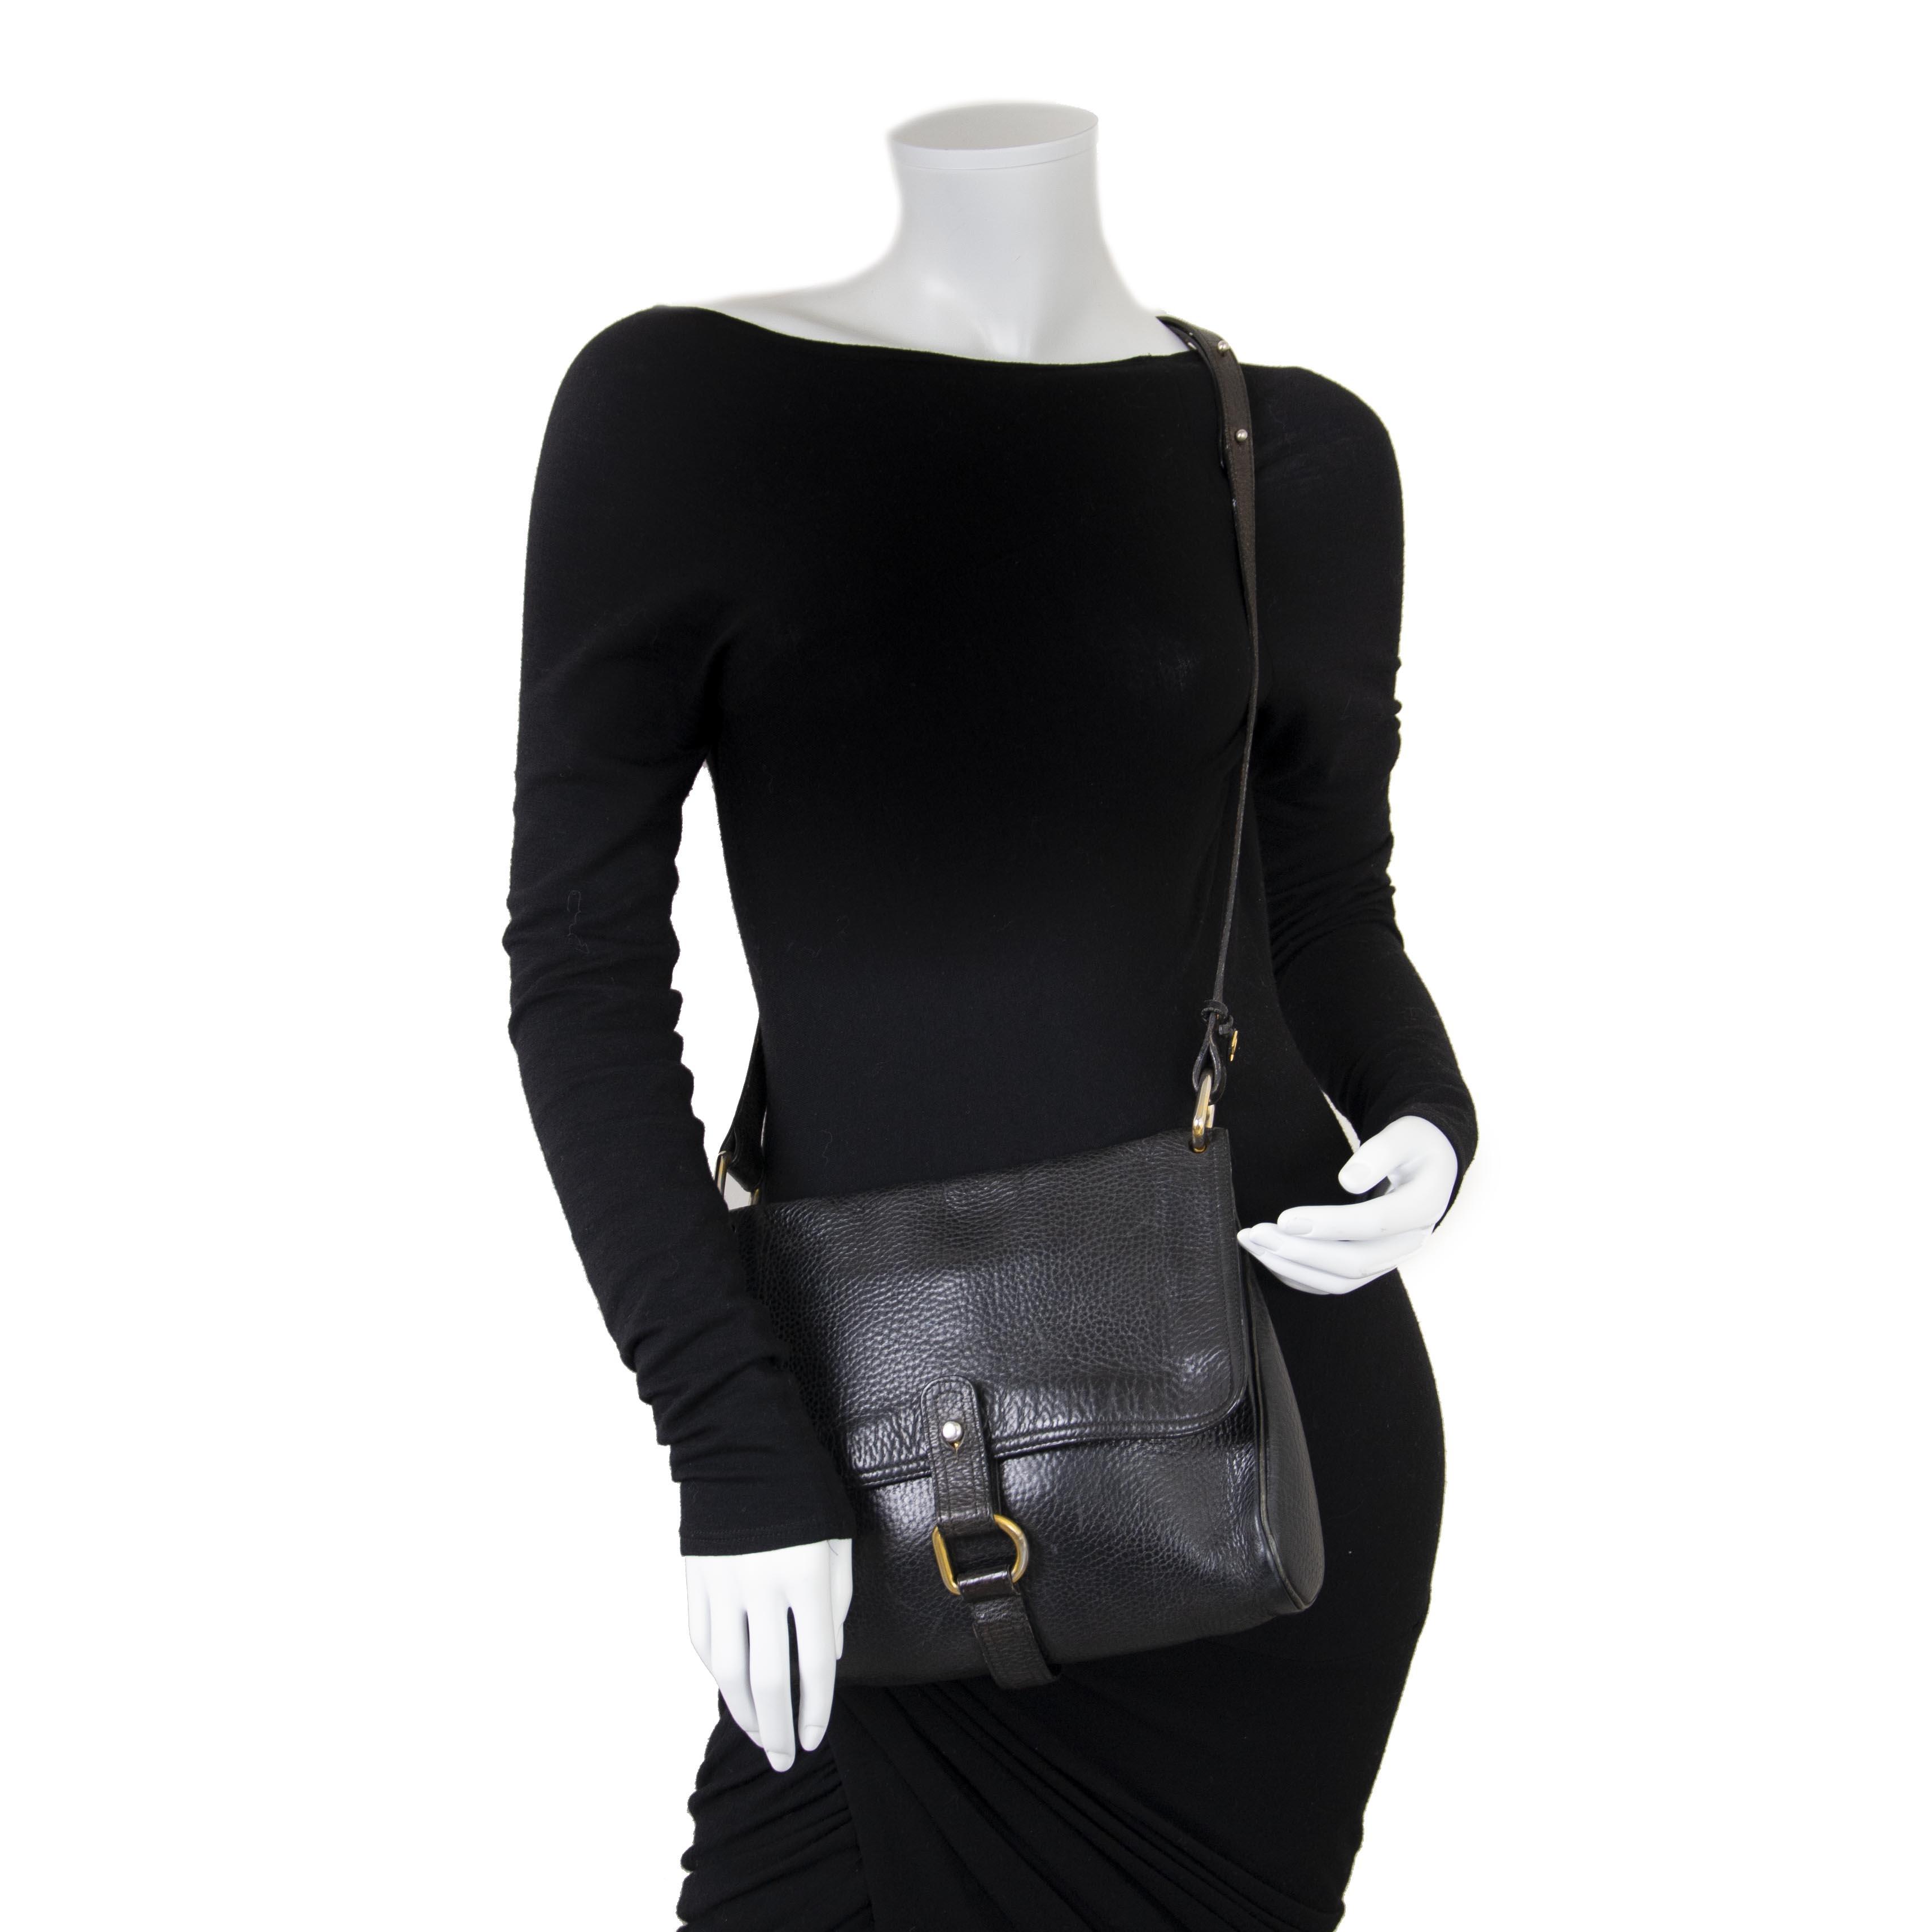 031884bfbd4e ... Delvaux Black Leather Fichu Shoulder Bag now for sale at labellov  vintage fashion webshop belgium